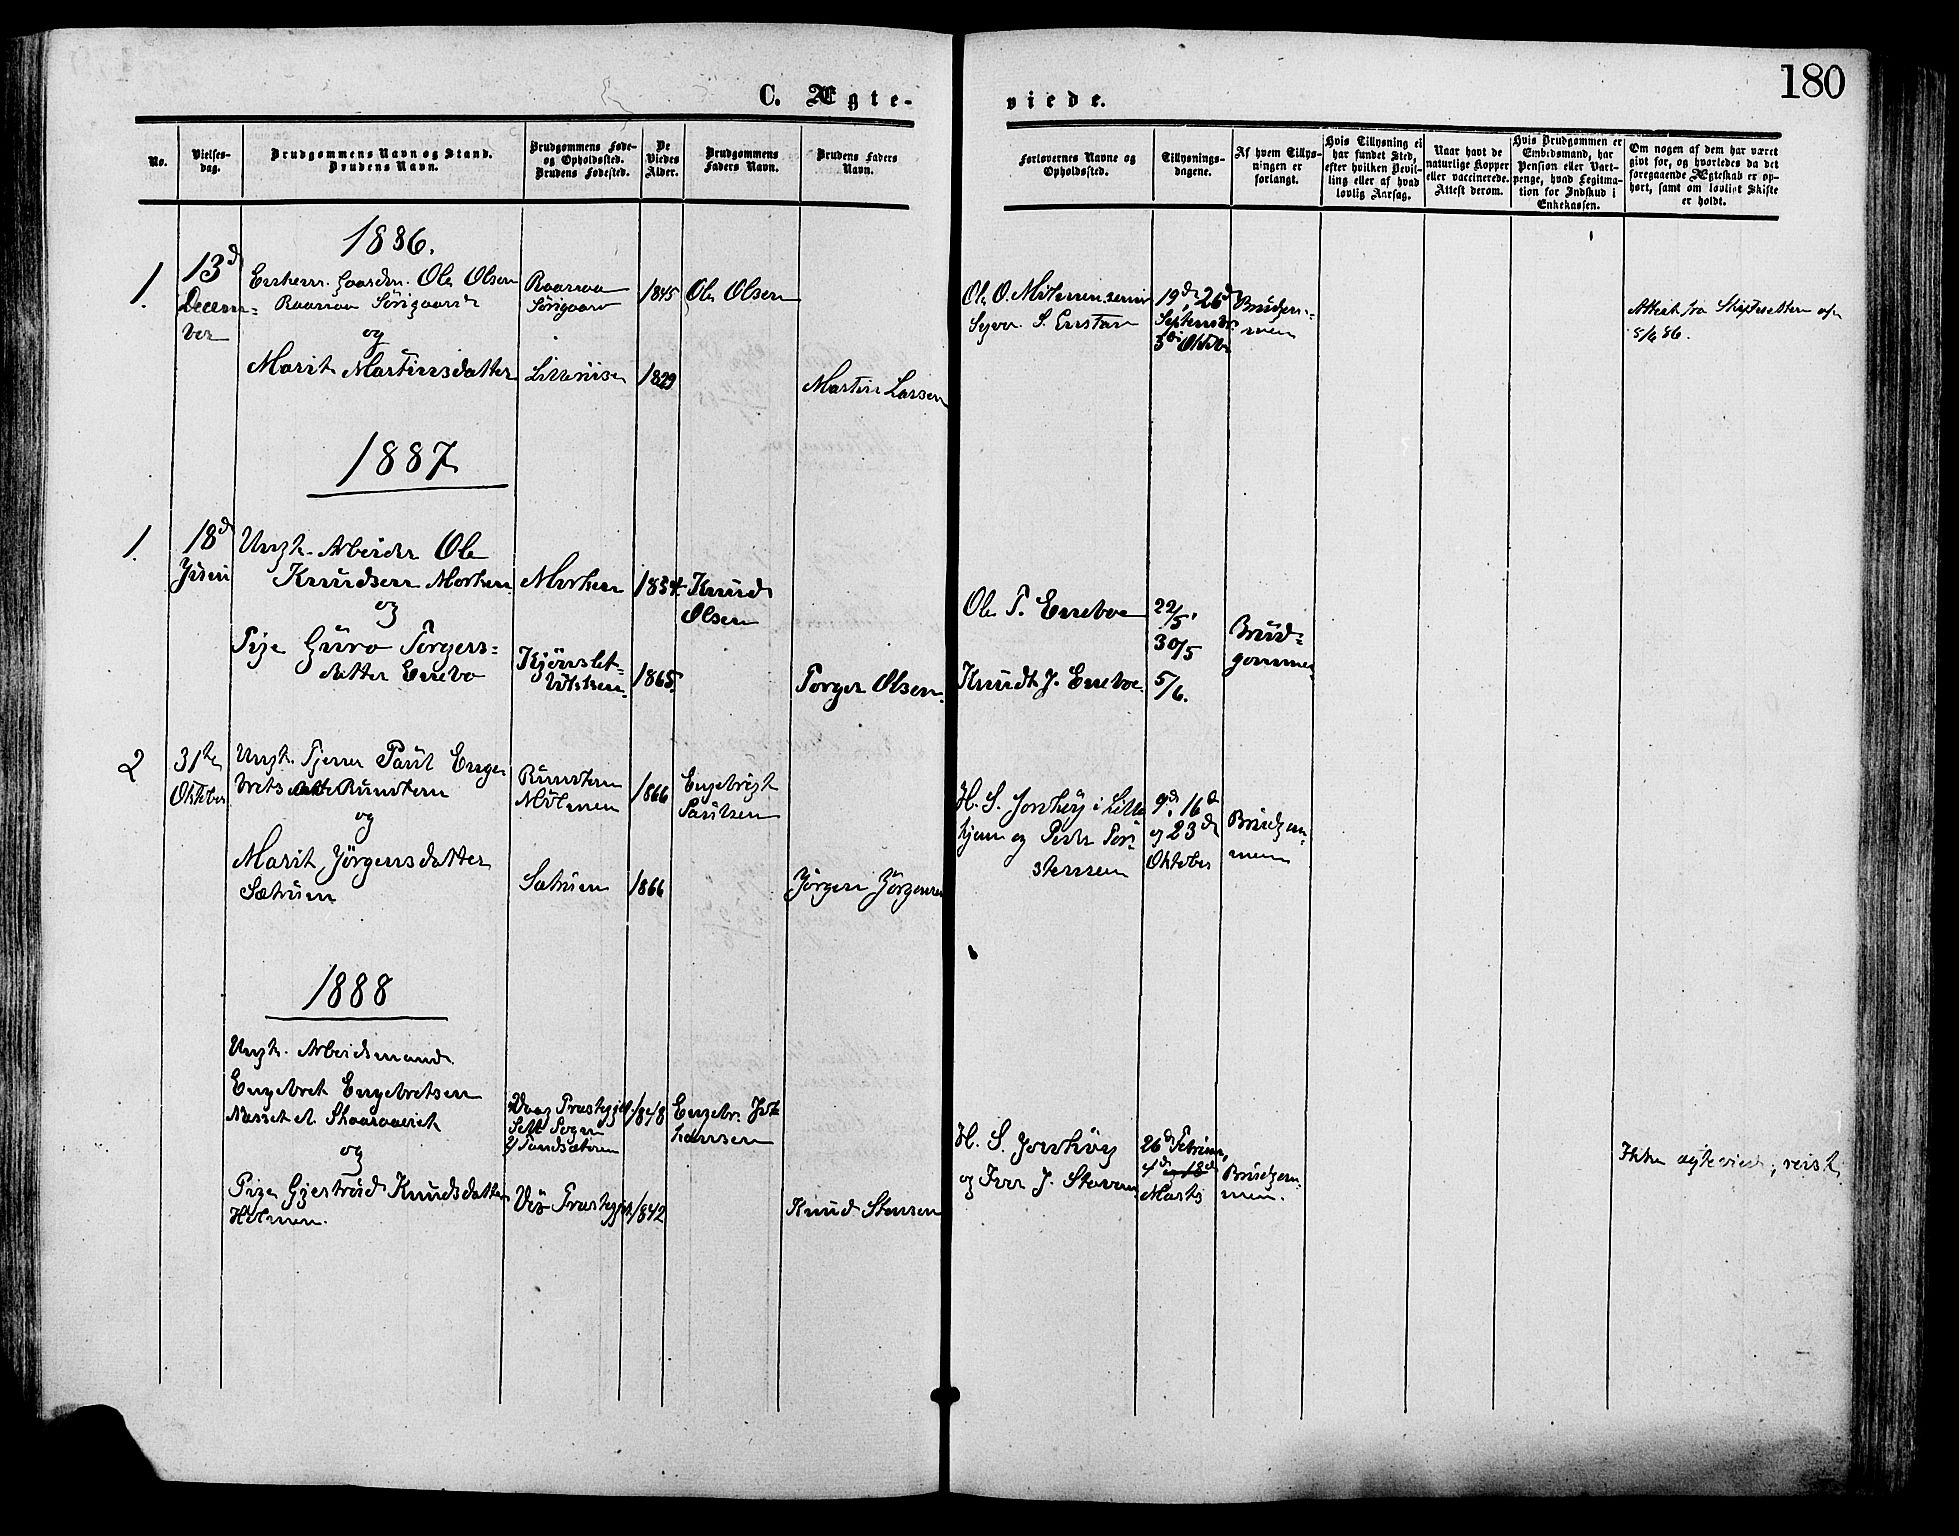 SAH, Lesja prestekontor, Ministerialbok nr. 9, 1854-1889, s. 180